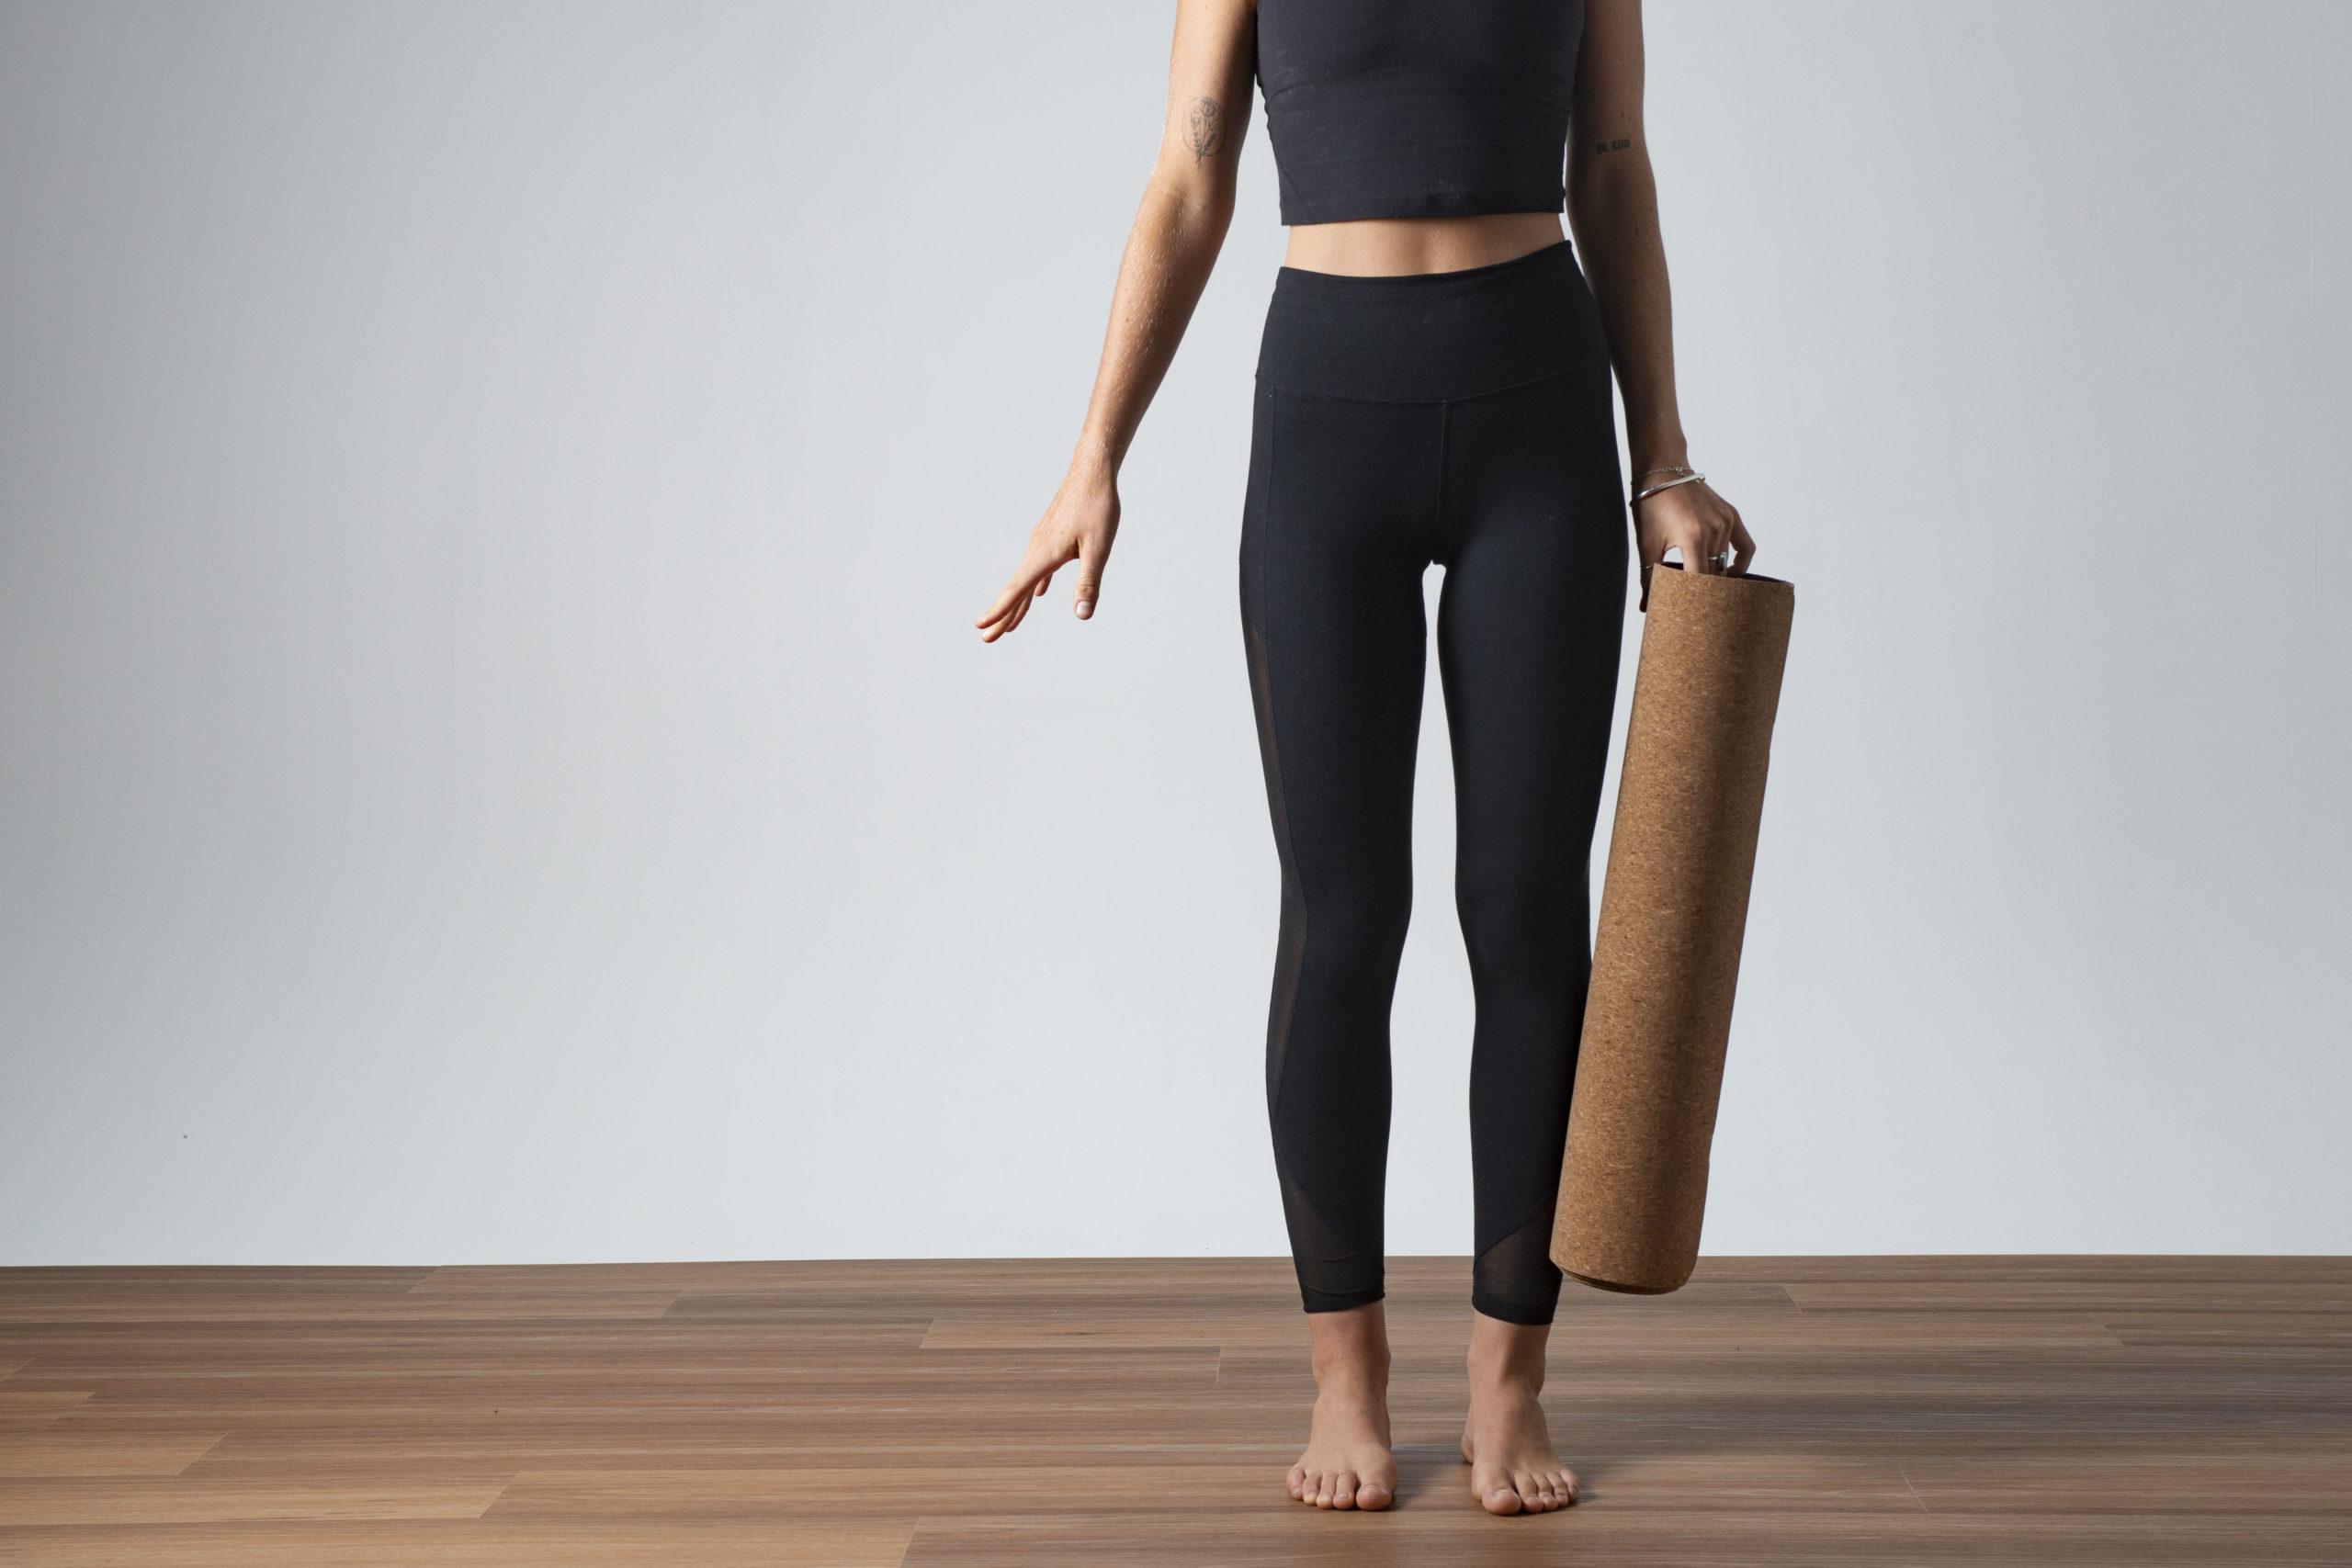 Yoga Matt and Physical Benefits